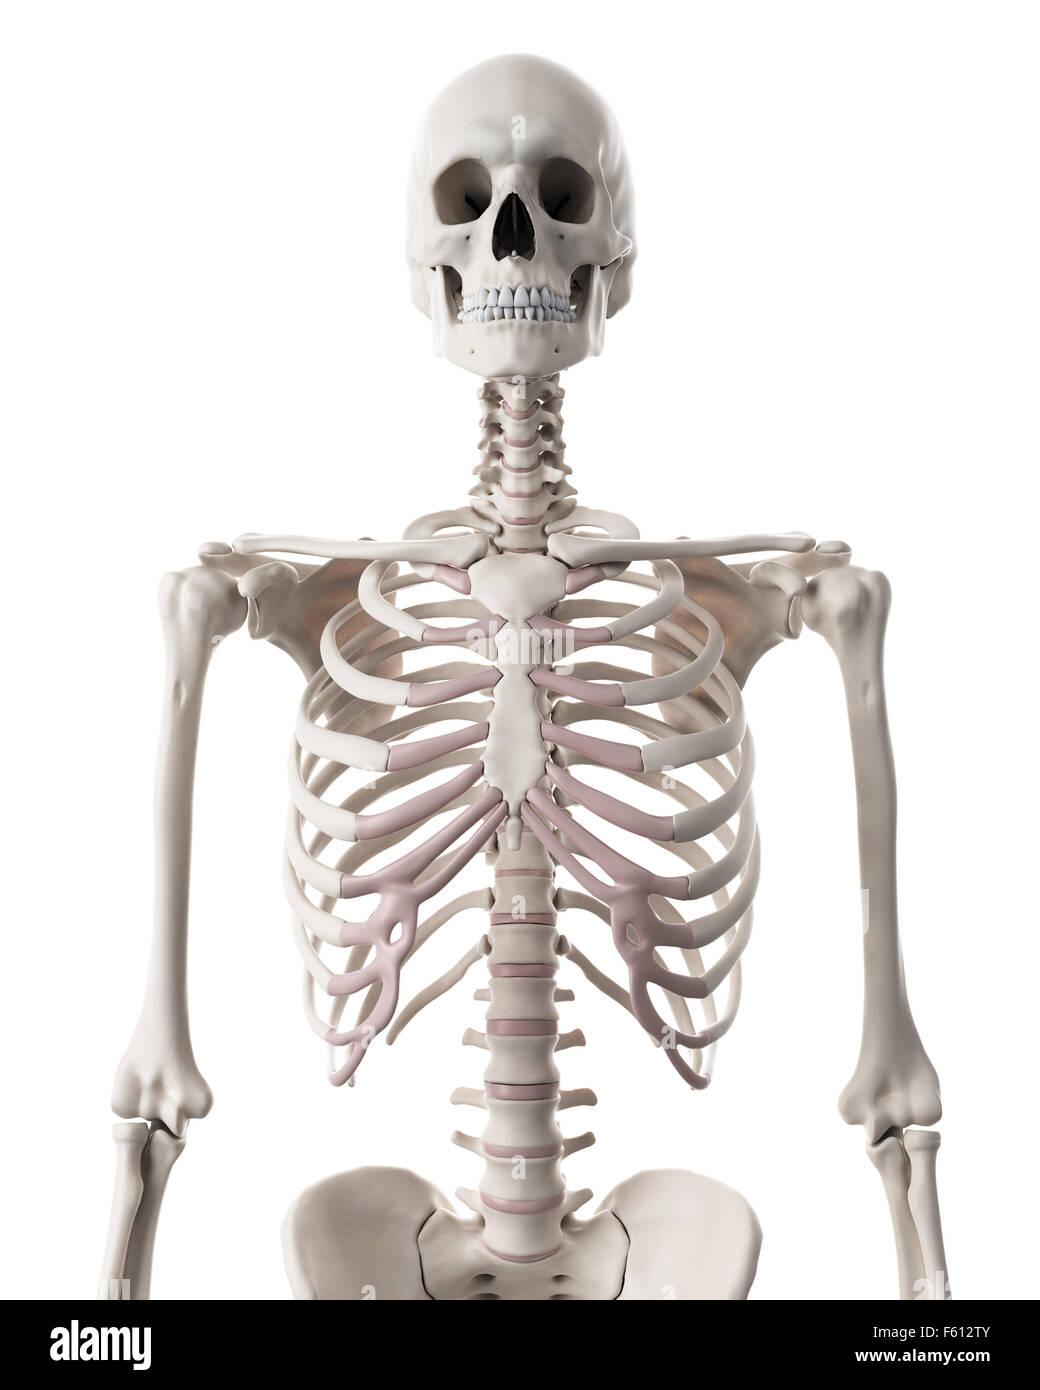 medizinisch genaue Abbildung des Skelettsystems - thorax Stockfoto ...